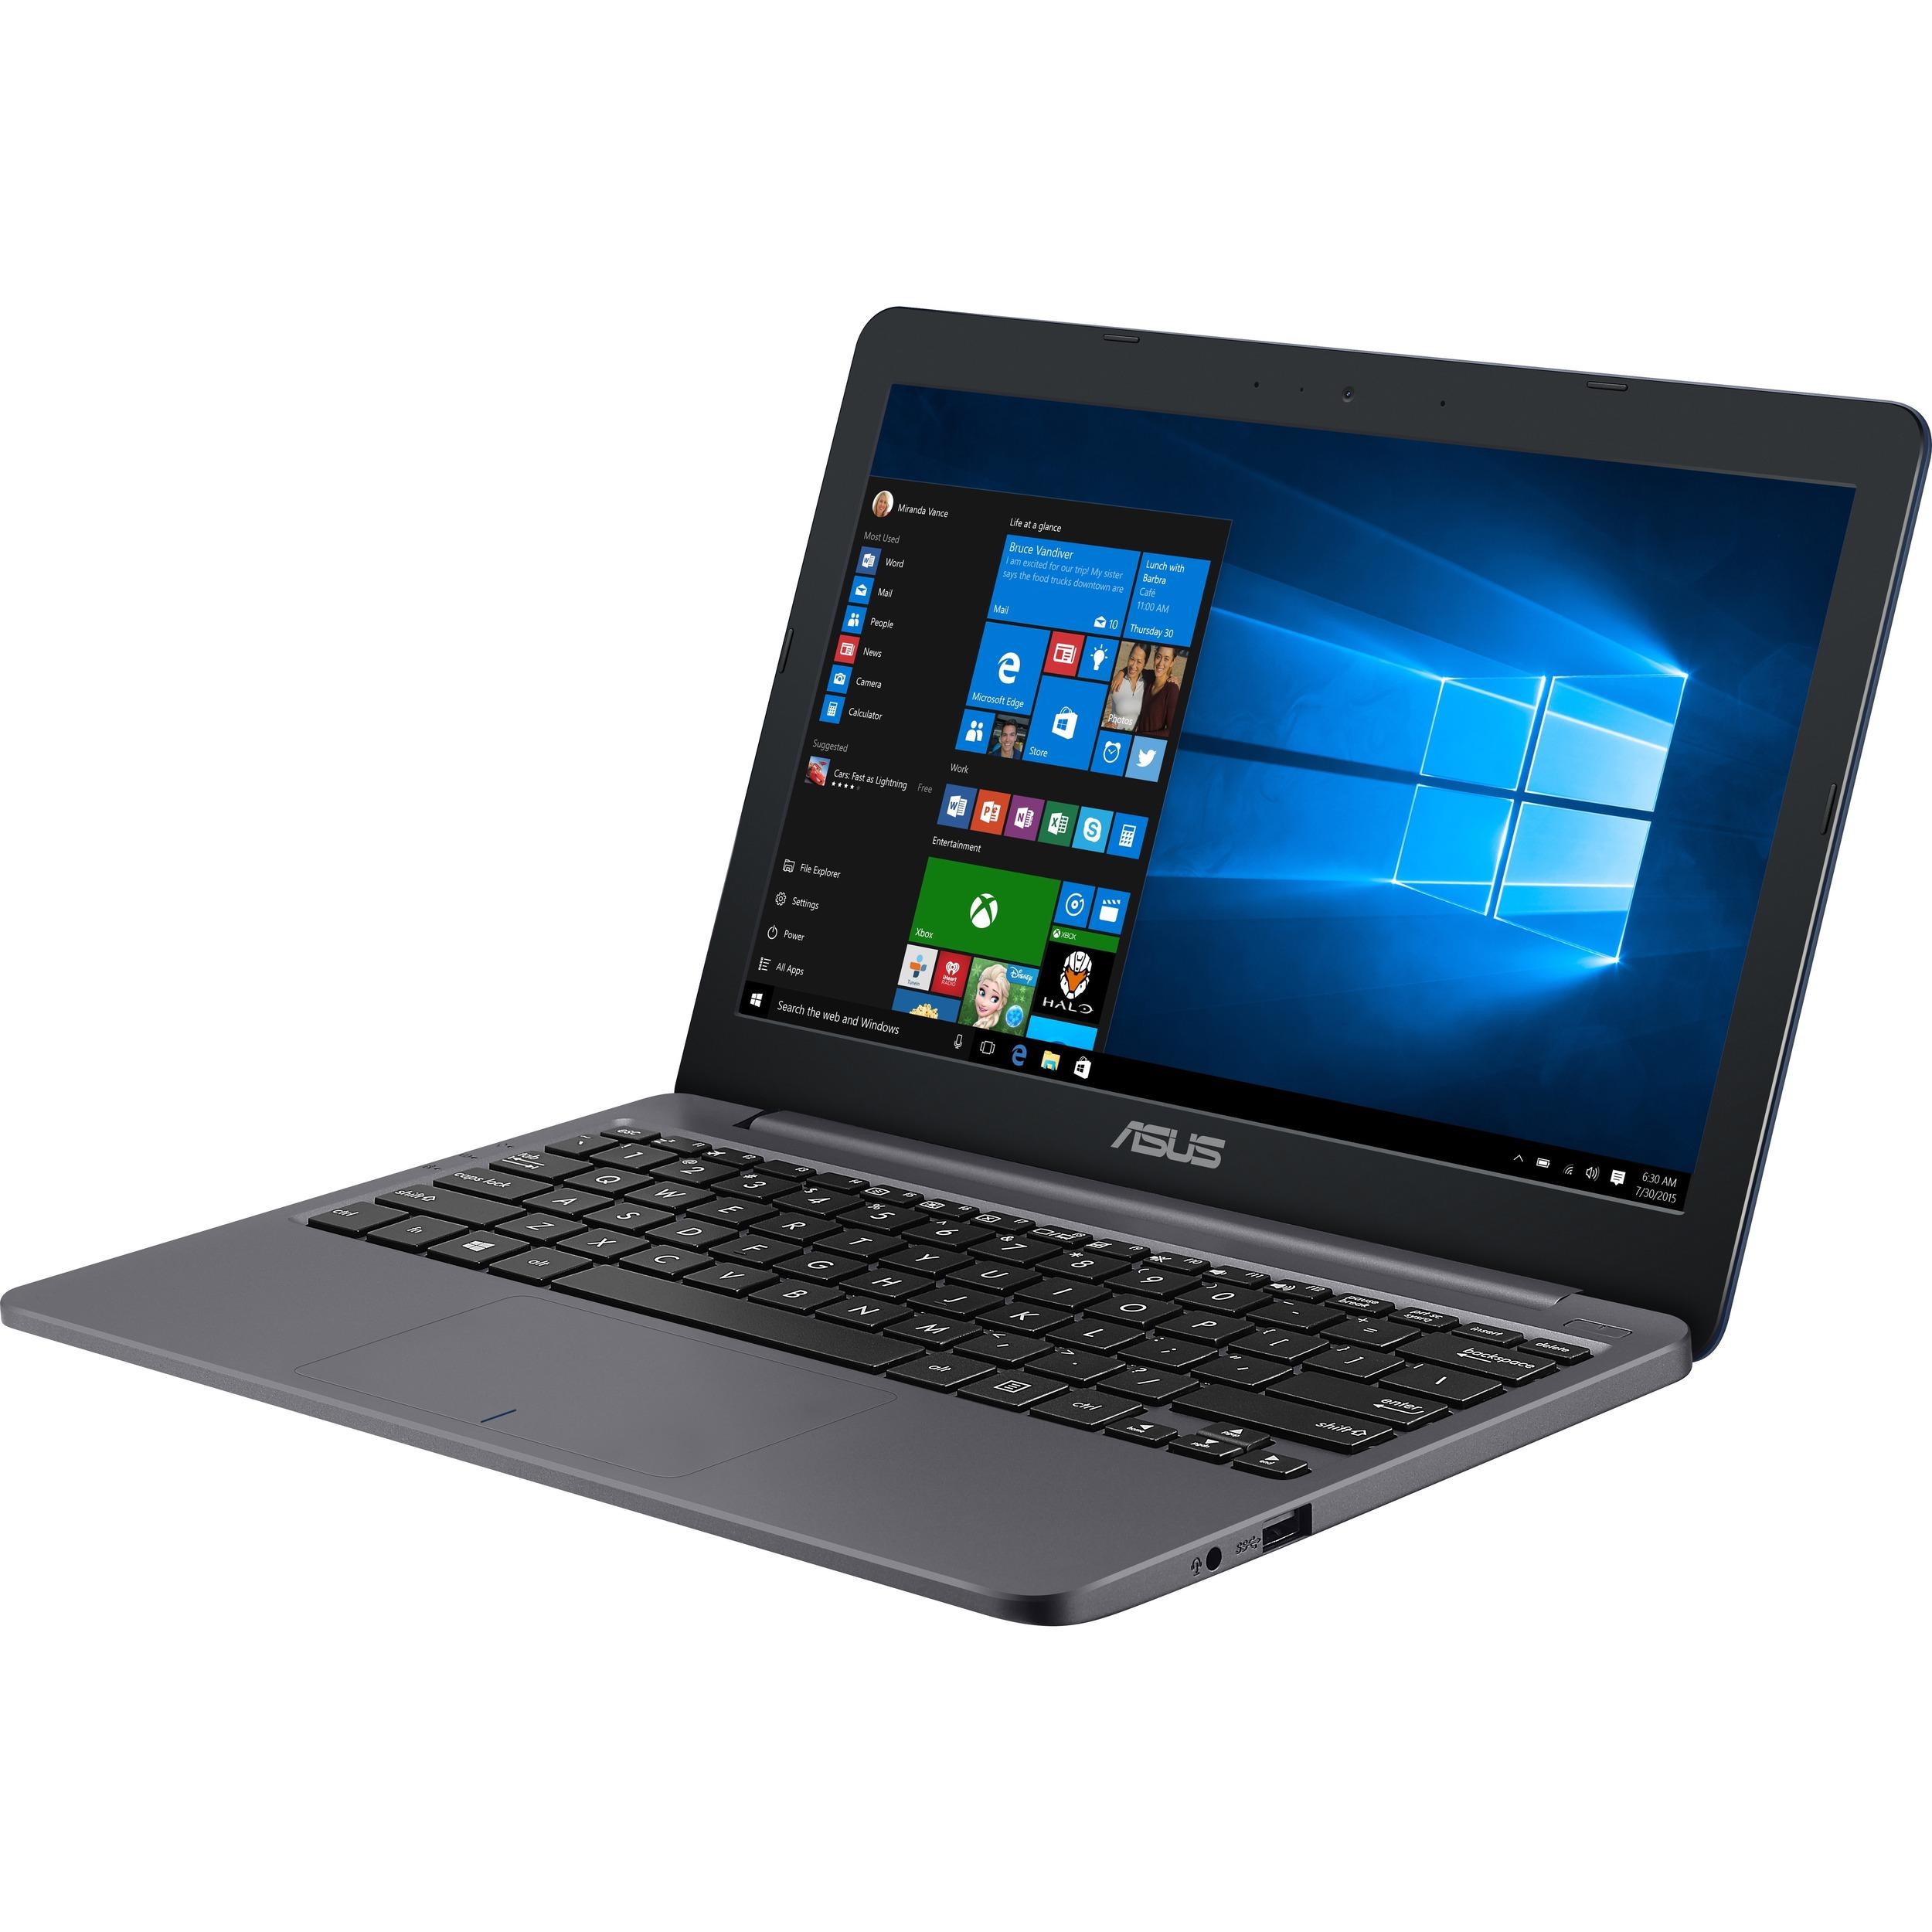 Asus VivoBook E12 E203MA-FD017TS 29.5 cm 11.6inch Netbook - 1366 x 768 - Celeron N4000 - 4 GB RAM - 64 GB Flash Memory - Star Gray - Windows 10 S 64-bit - Intel UHD G